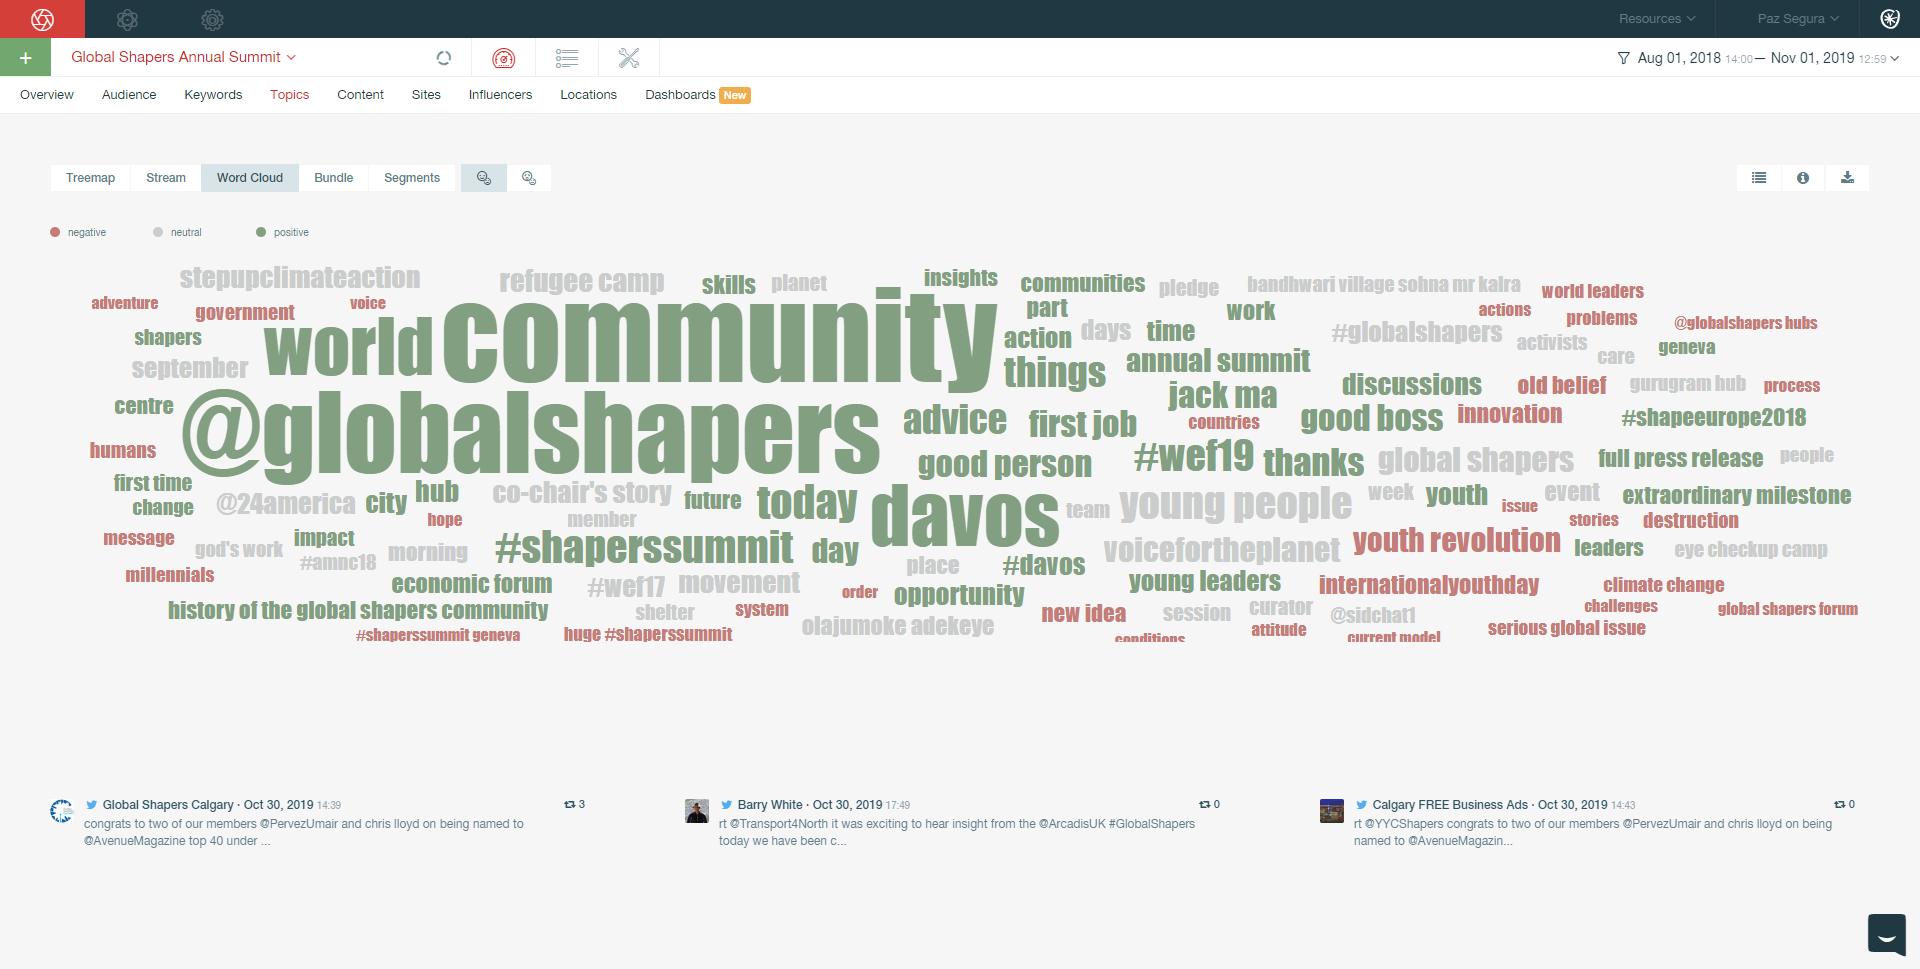 Pulsar TRAC- Global Shappers - Conversation aug 2018 sept 2019 - Topics - Word Cloud